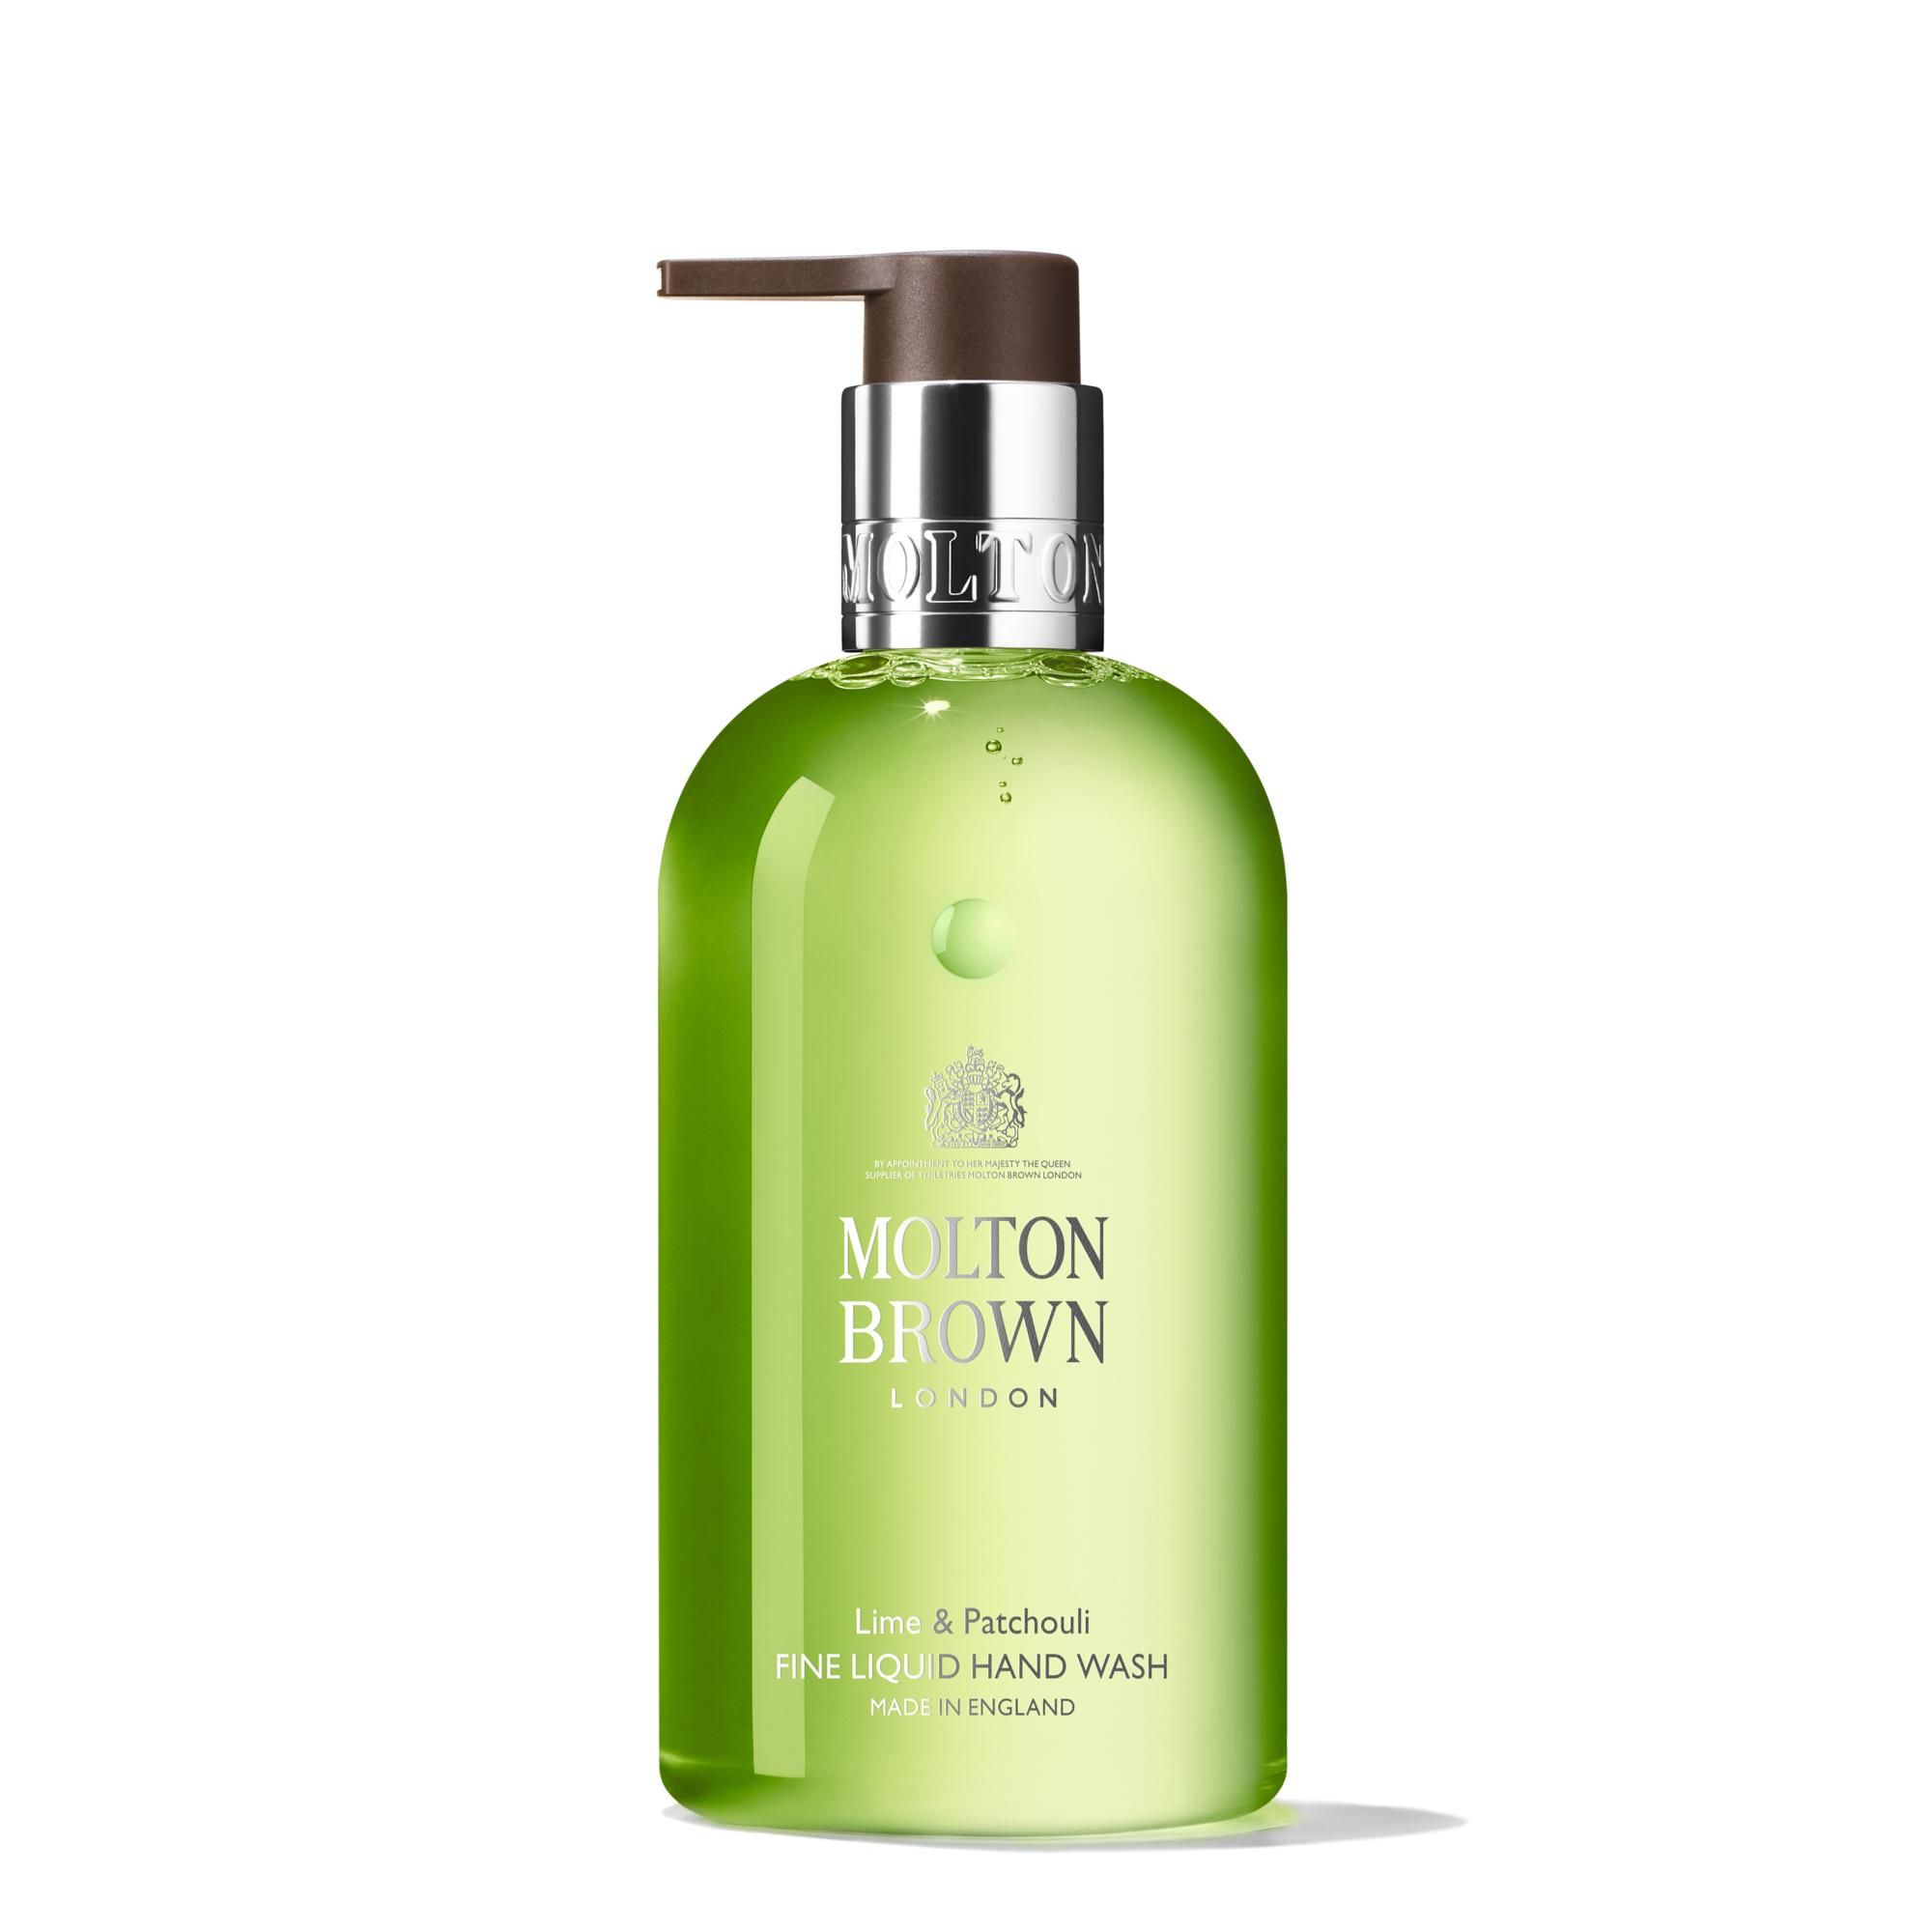 Molton Brown Lime & Patchouli Fine Liquid Hand Wash (300ml, 5l)